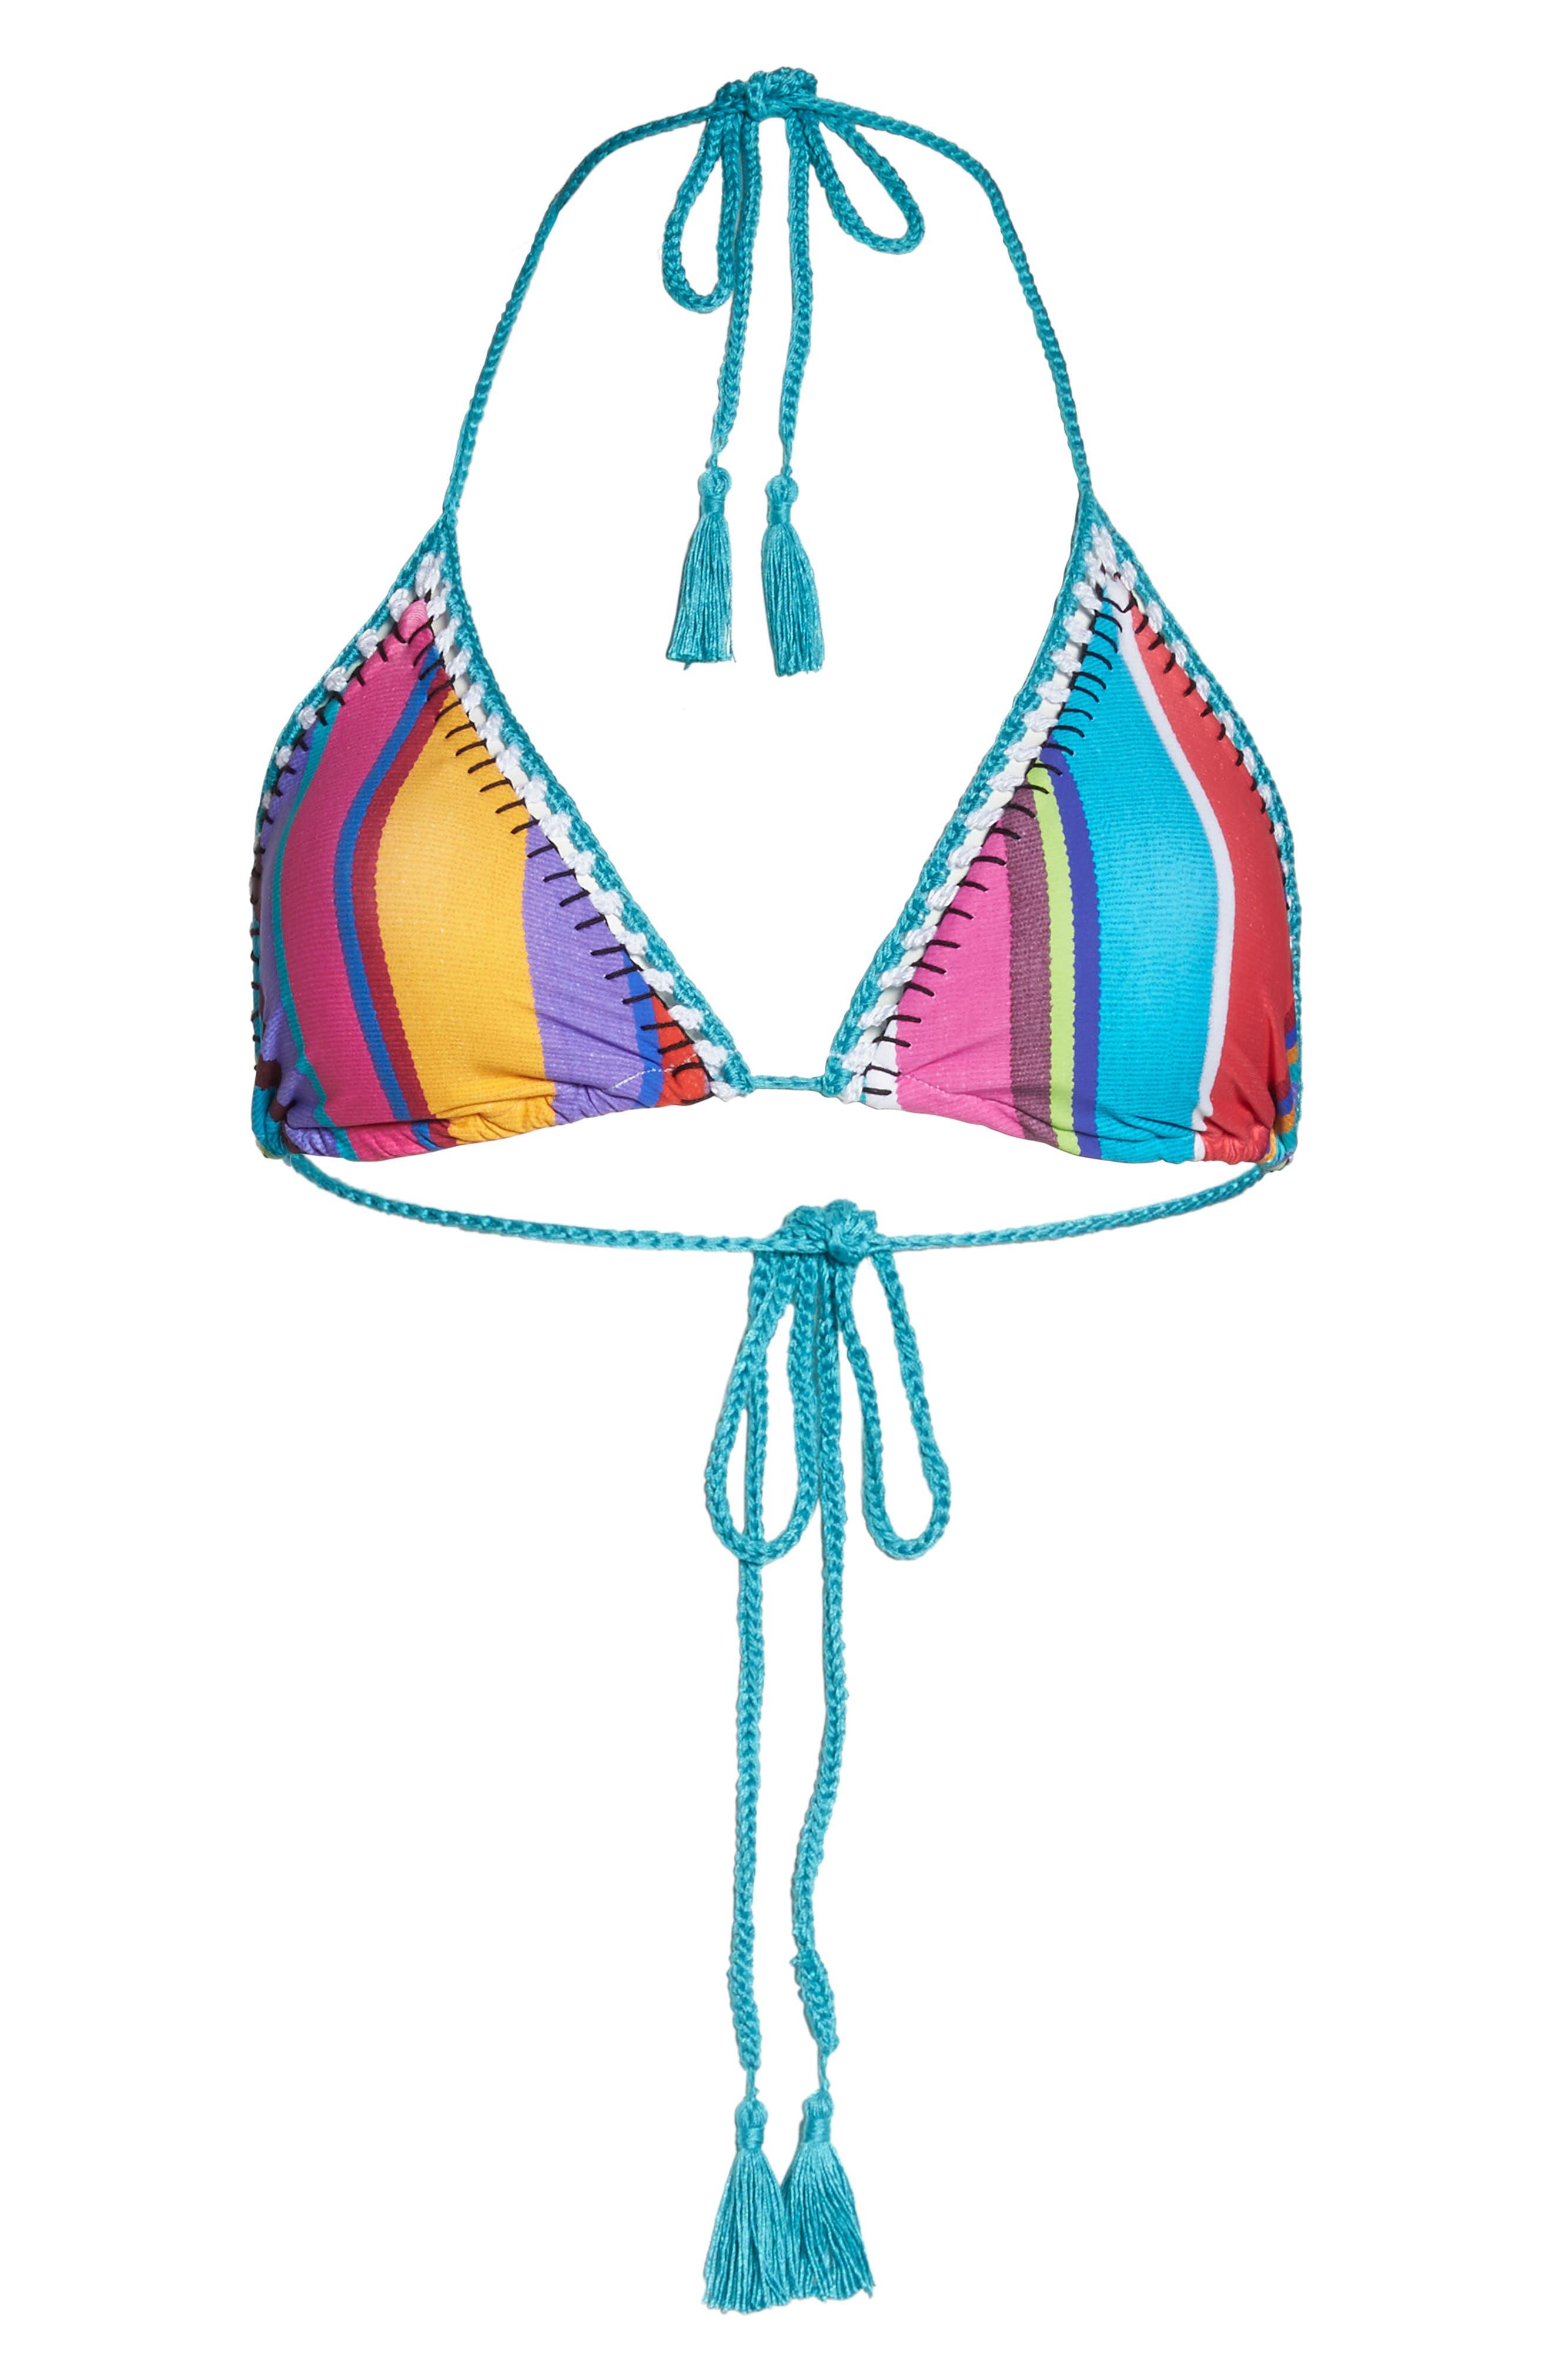 Sayulita Vixen Triangle Bikini Top,                             Alternate thumbnail 6, color,                             Multi